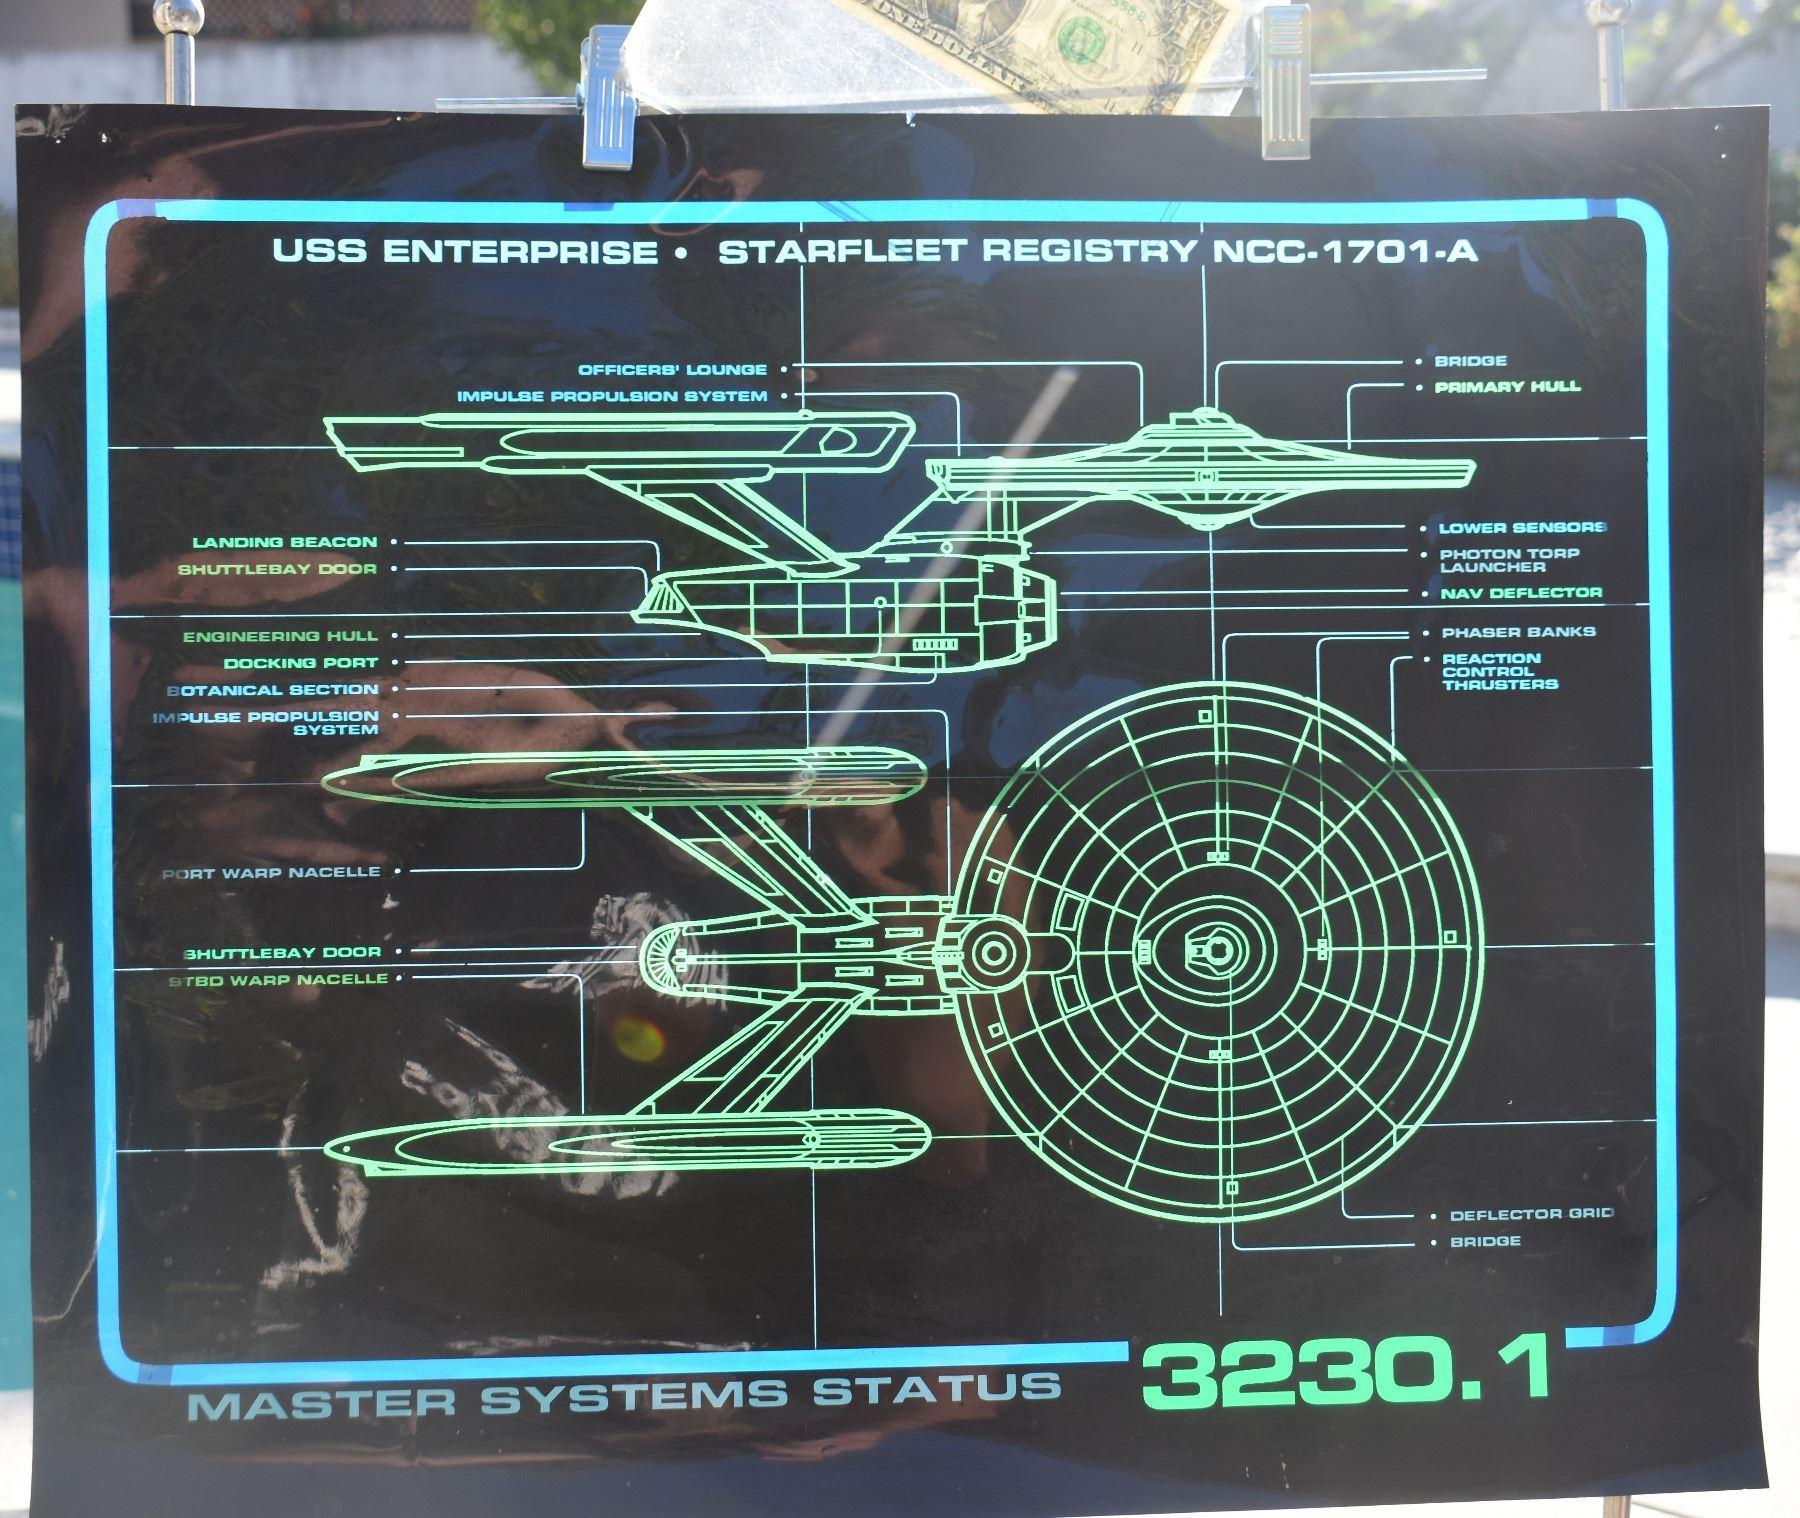 STAR TREK TNG STARSHIP ENTERPRISE SCREEN USED CONTROL PANEL A-GRADE 03